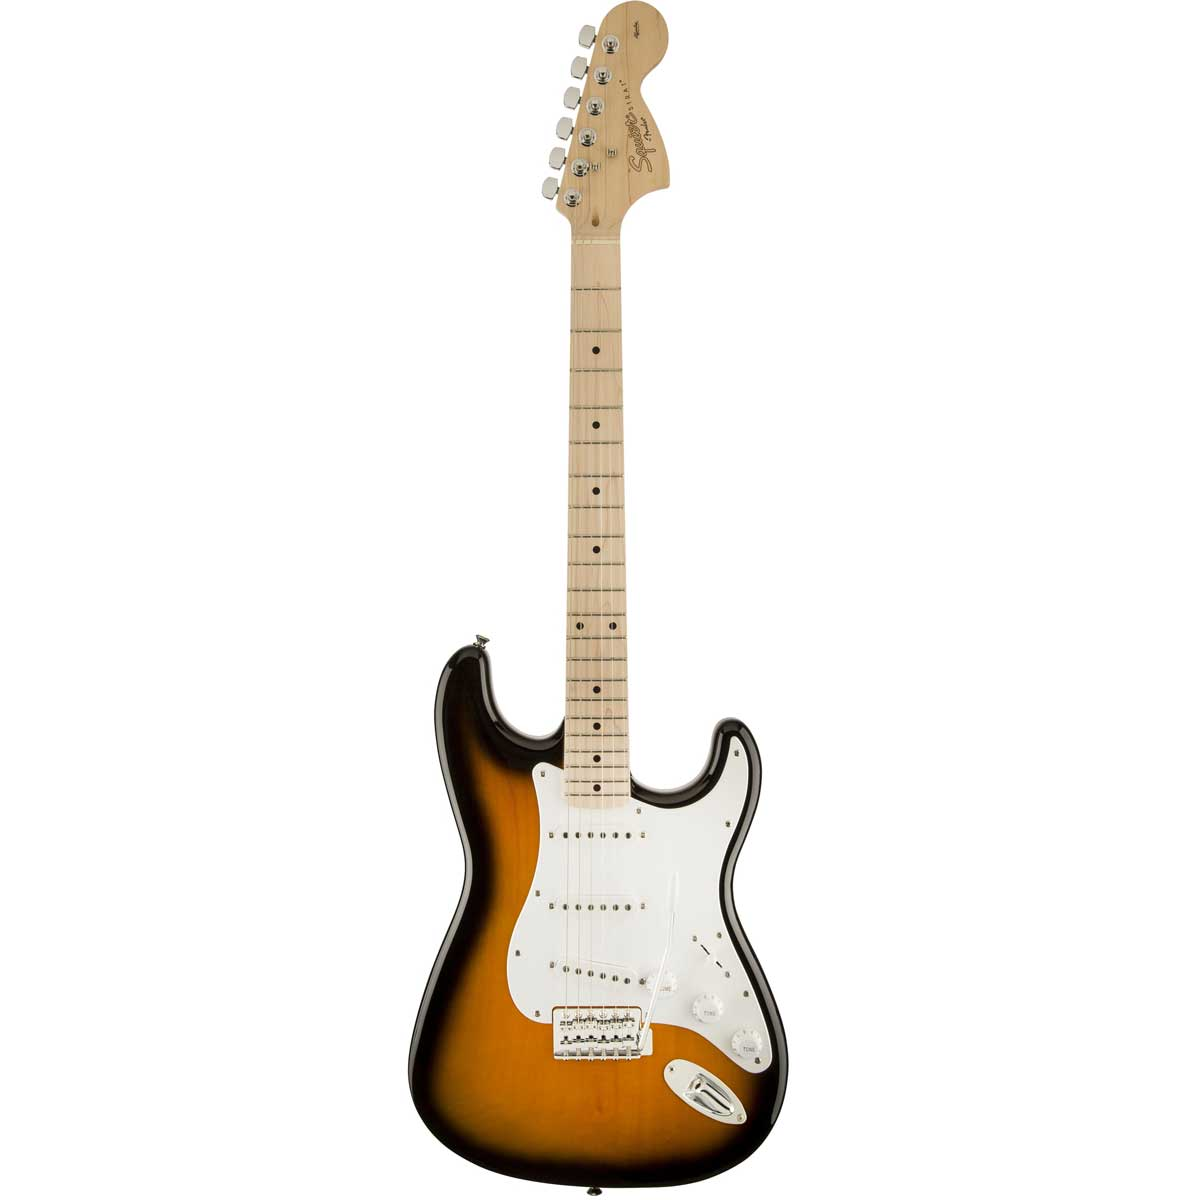 FenderSquier AffinitySeriesStratocaster,MN,2TS el-guitar 2-tonesunburst